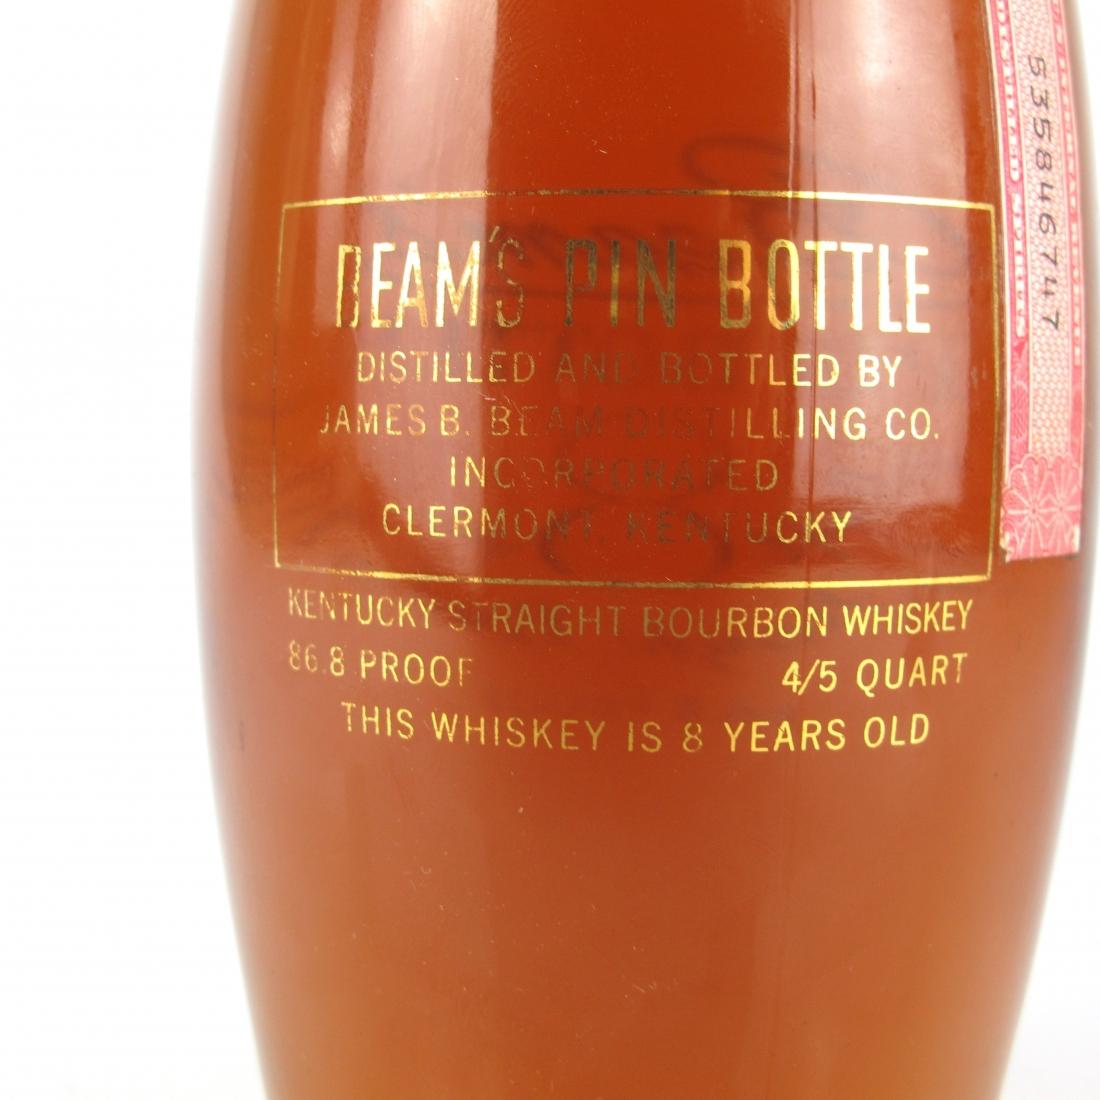 Jim Beam / Beam's Pin Bottle 8 Year Old